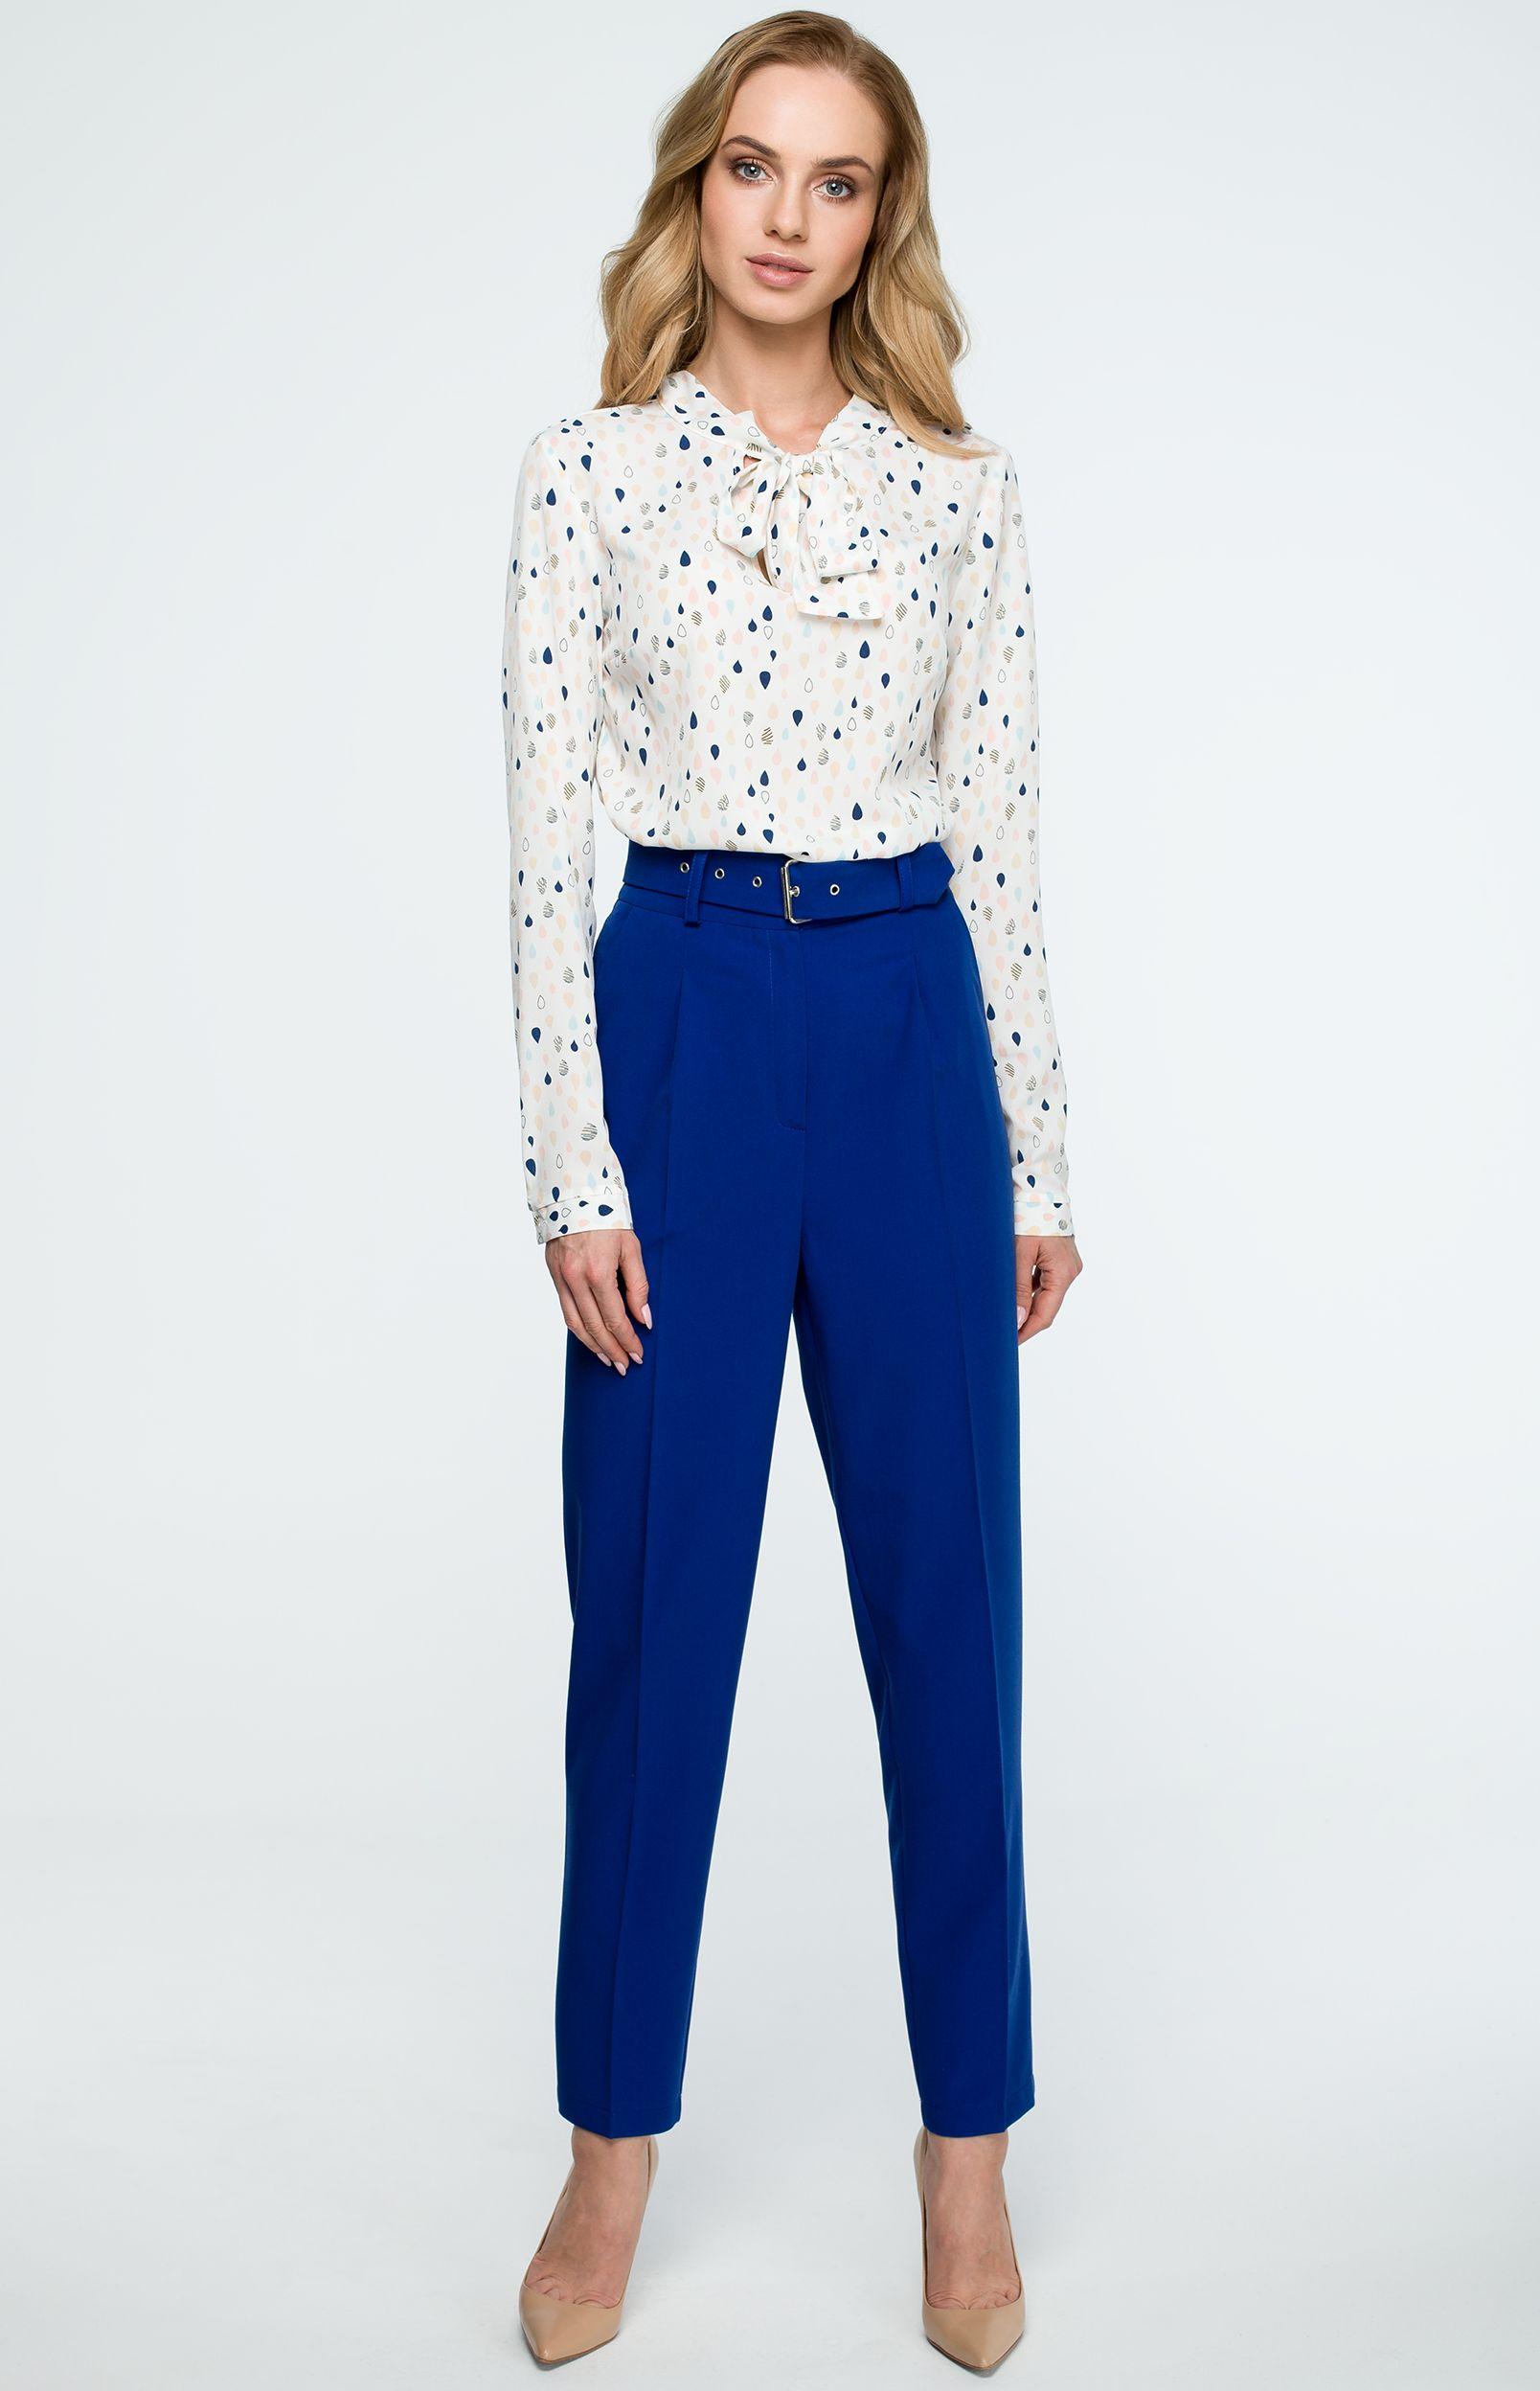 39c4cf1ade8a0a Pantalon cigarette bleu